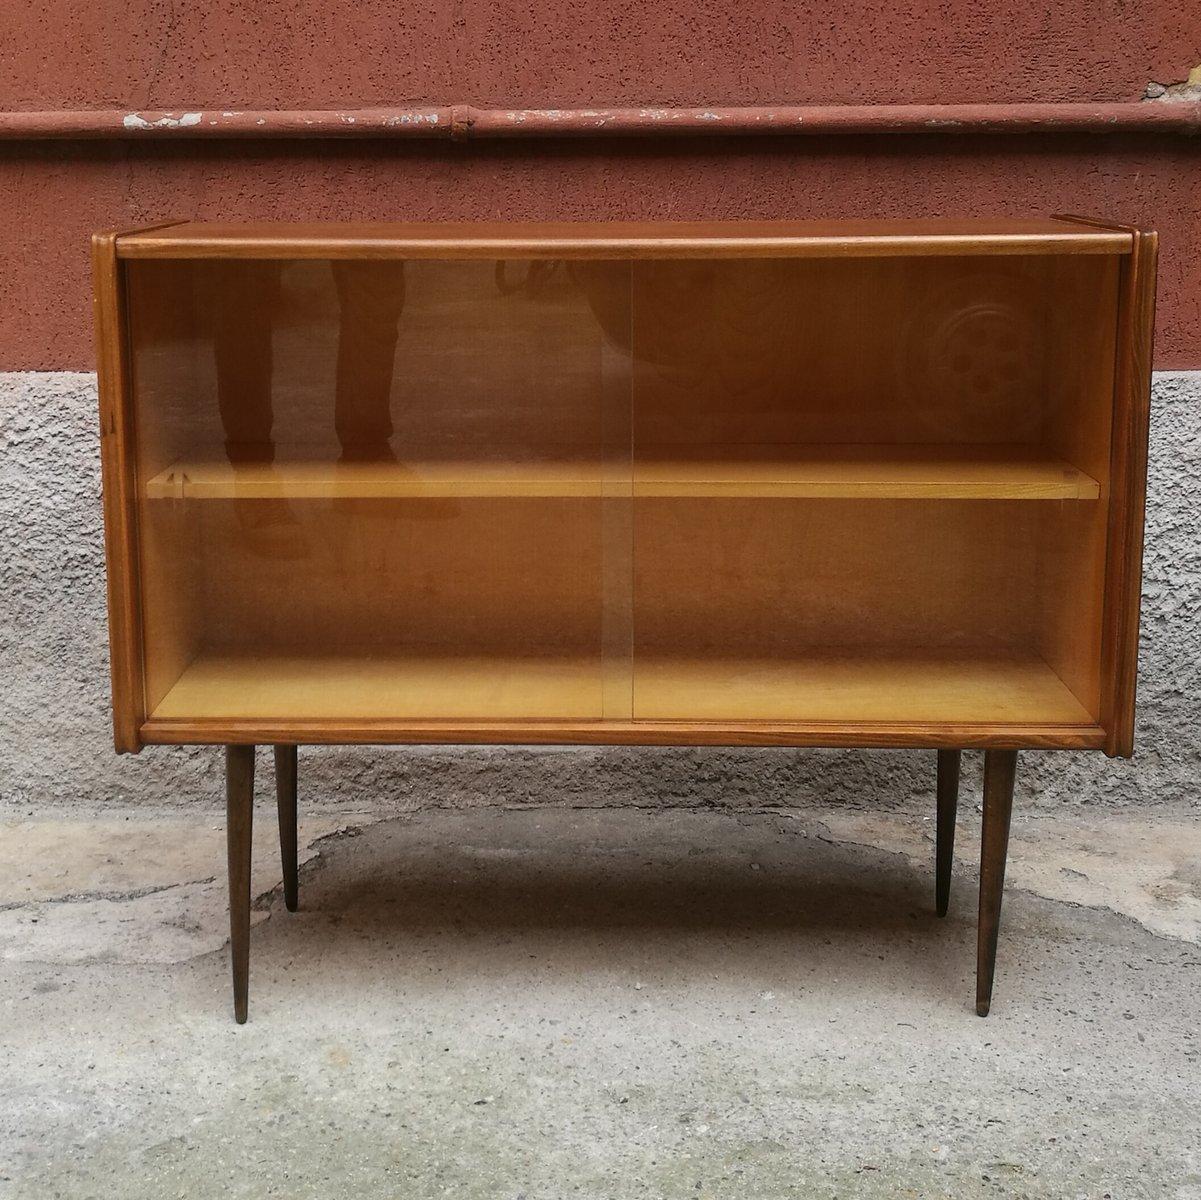 D nisches vintage sideboard 1960er haustechnik thiel for Sideboard danisches design